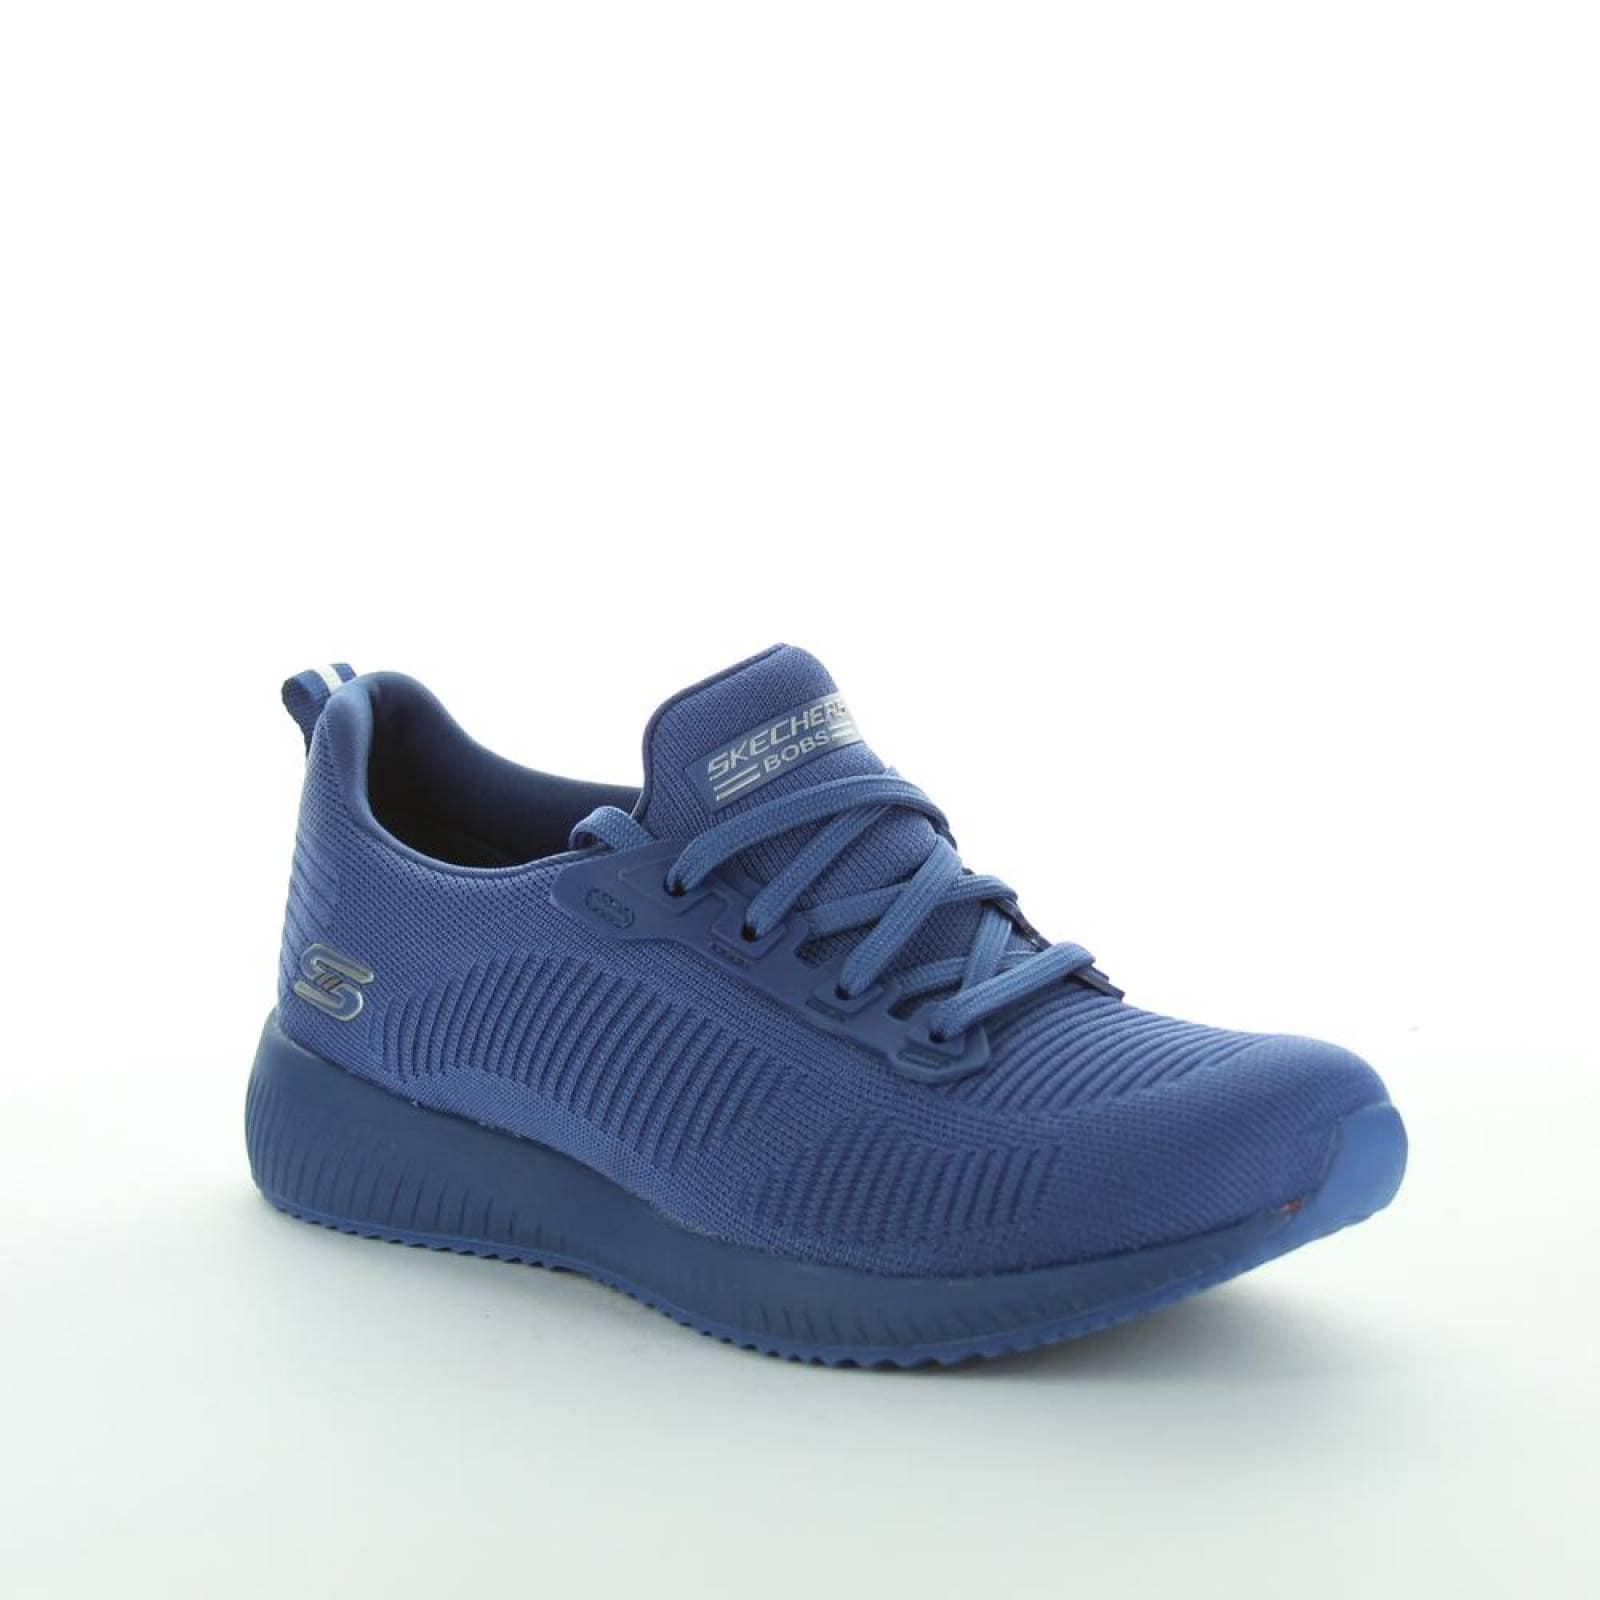 skechers mujer azul